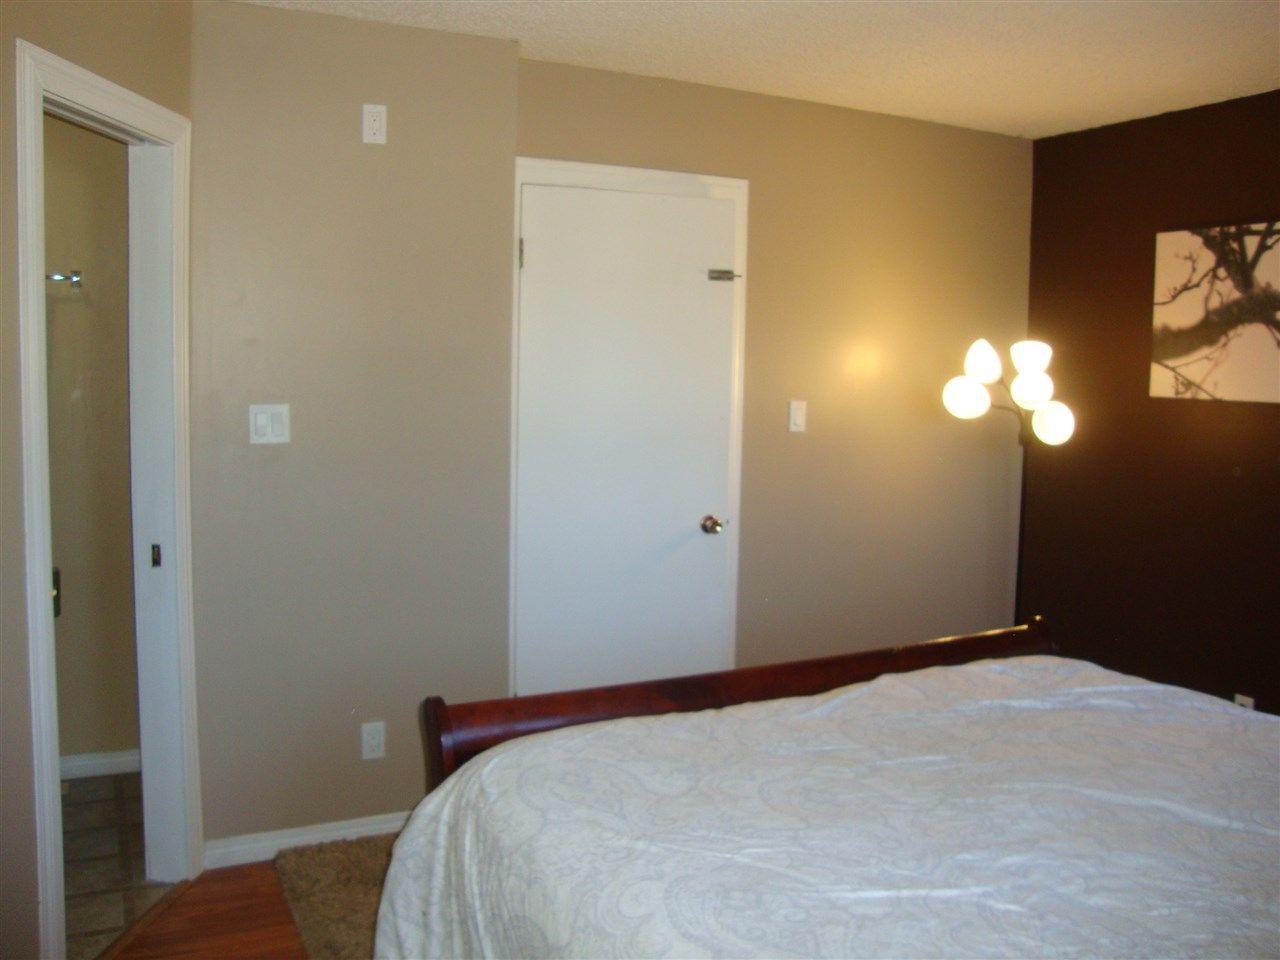 Photo 19: Photos: 4711 51A Avenue: Bon Accord House for sale : MLS®# E4149195